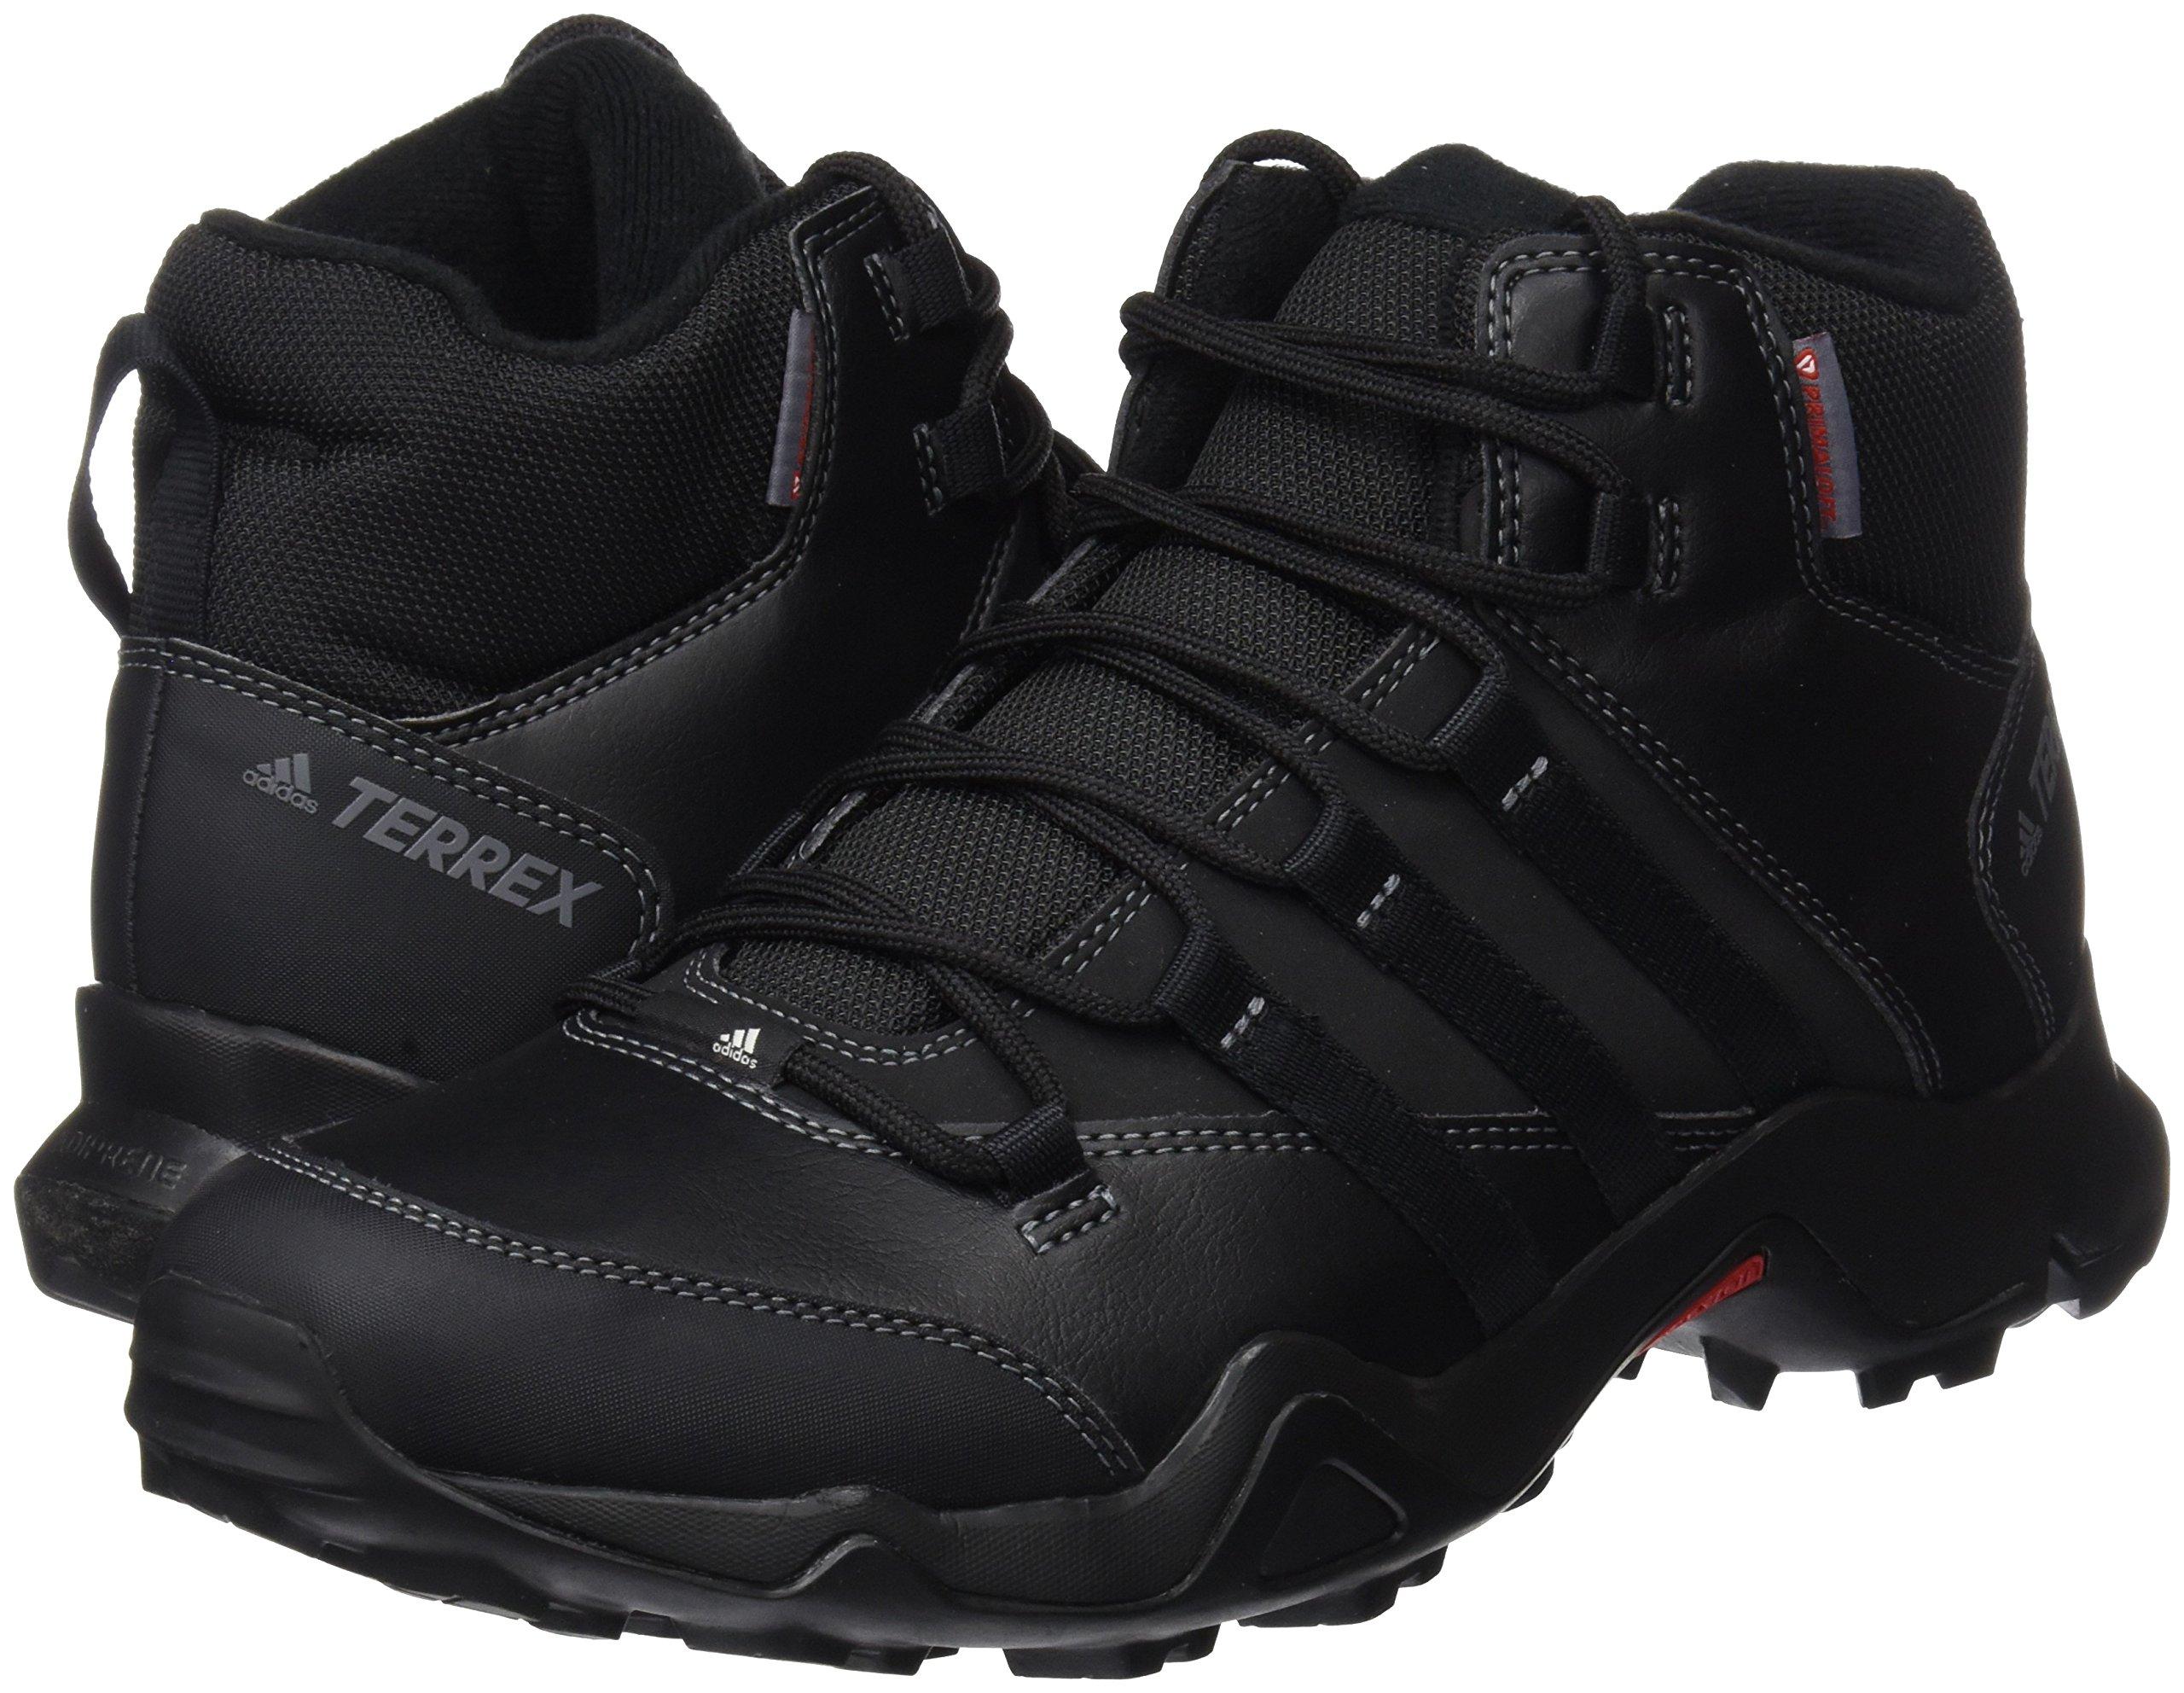 91%2BzMsrIgGL - adidas Men's Terrex Ax2r Beta Mid Cw High Rise Hiking Boots